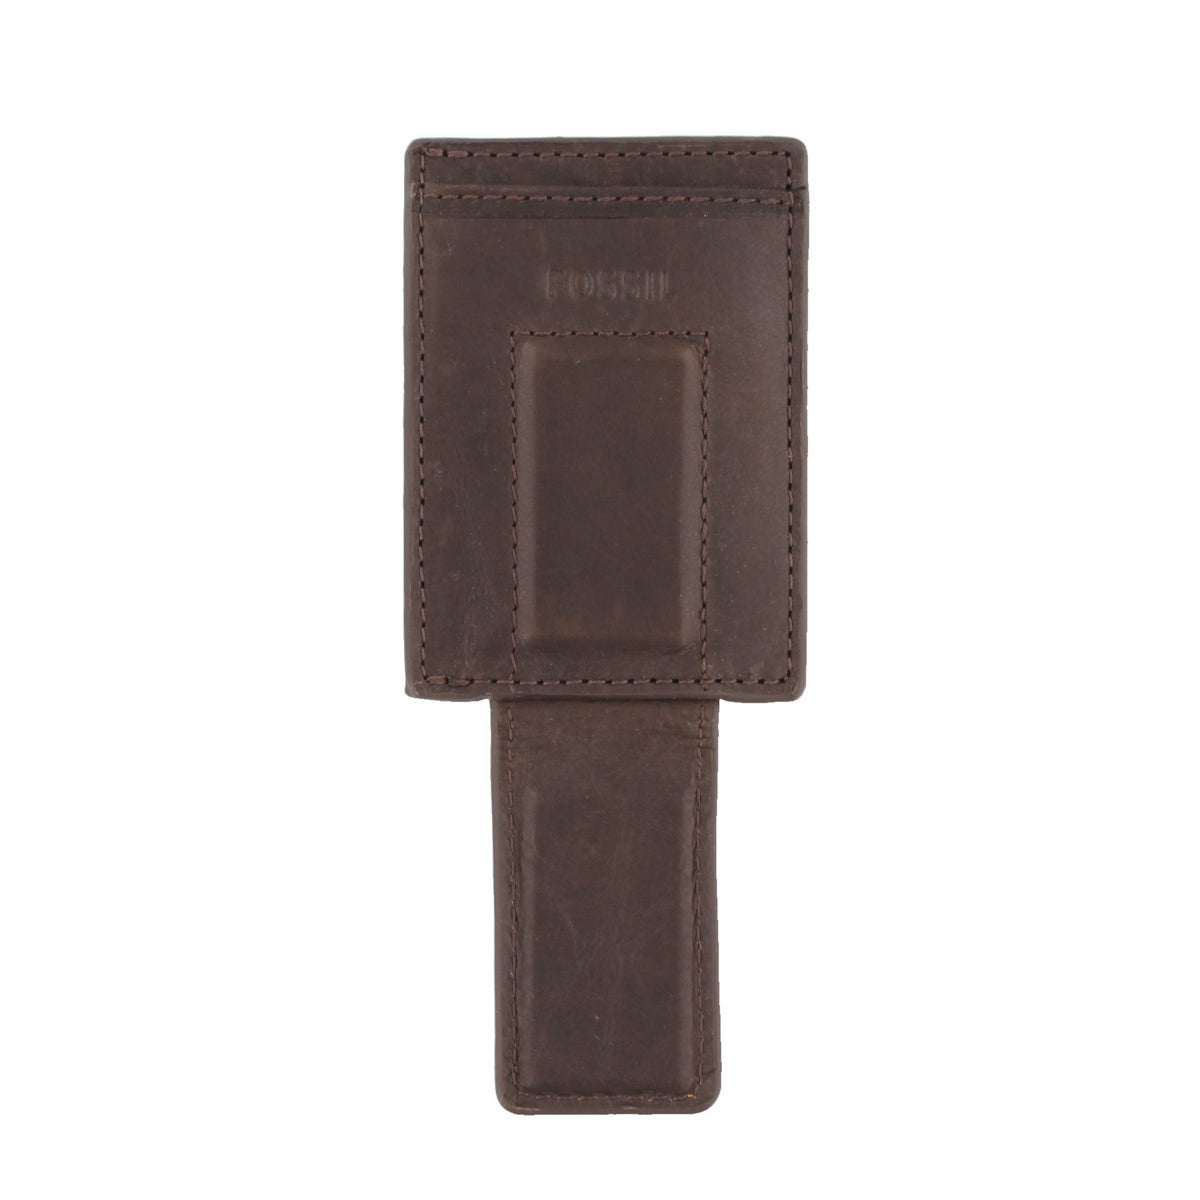 Mns Ingram brn leather multi card case